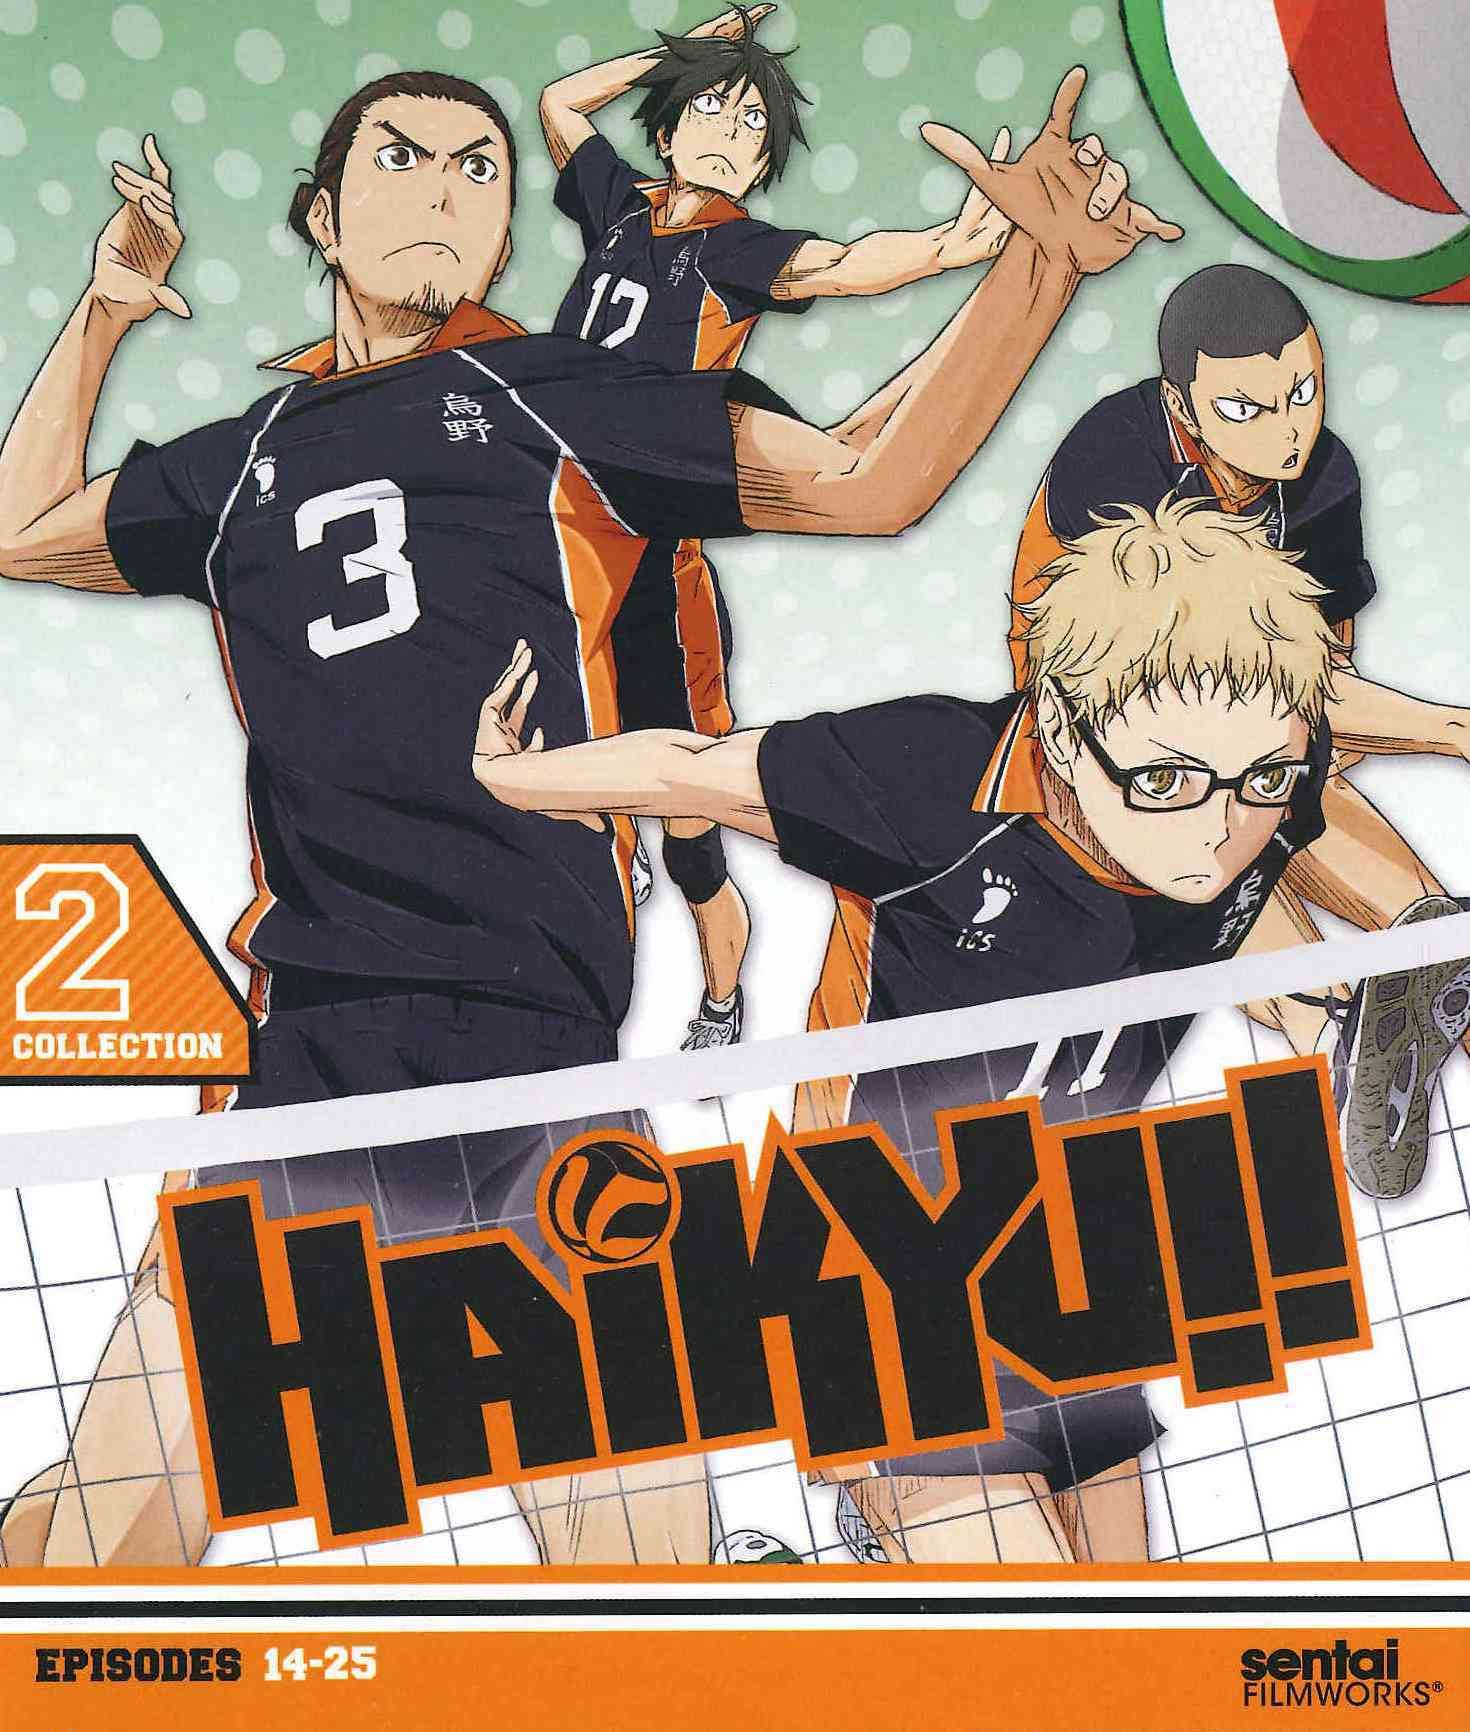 Haikyu!! Collection 2 Haikyuu, Haikyu!!, Sports anime